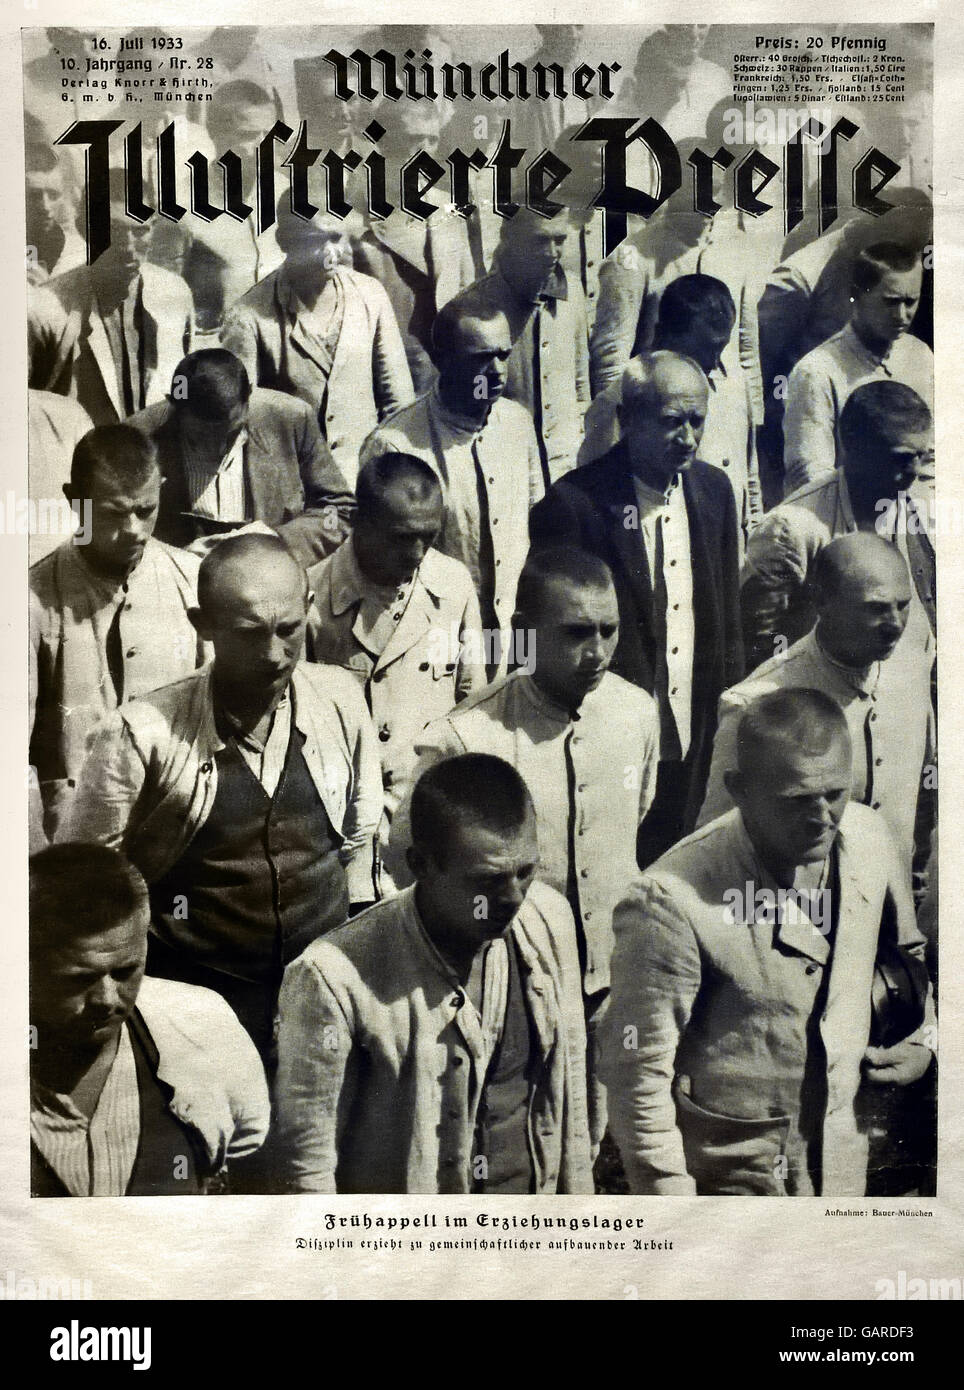 Report in Munich Illustrated Press about the educational camp Dachau Munchen 16 Juli 1933 Berlin Nazi Germany - Stock Image